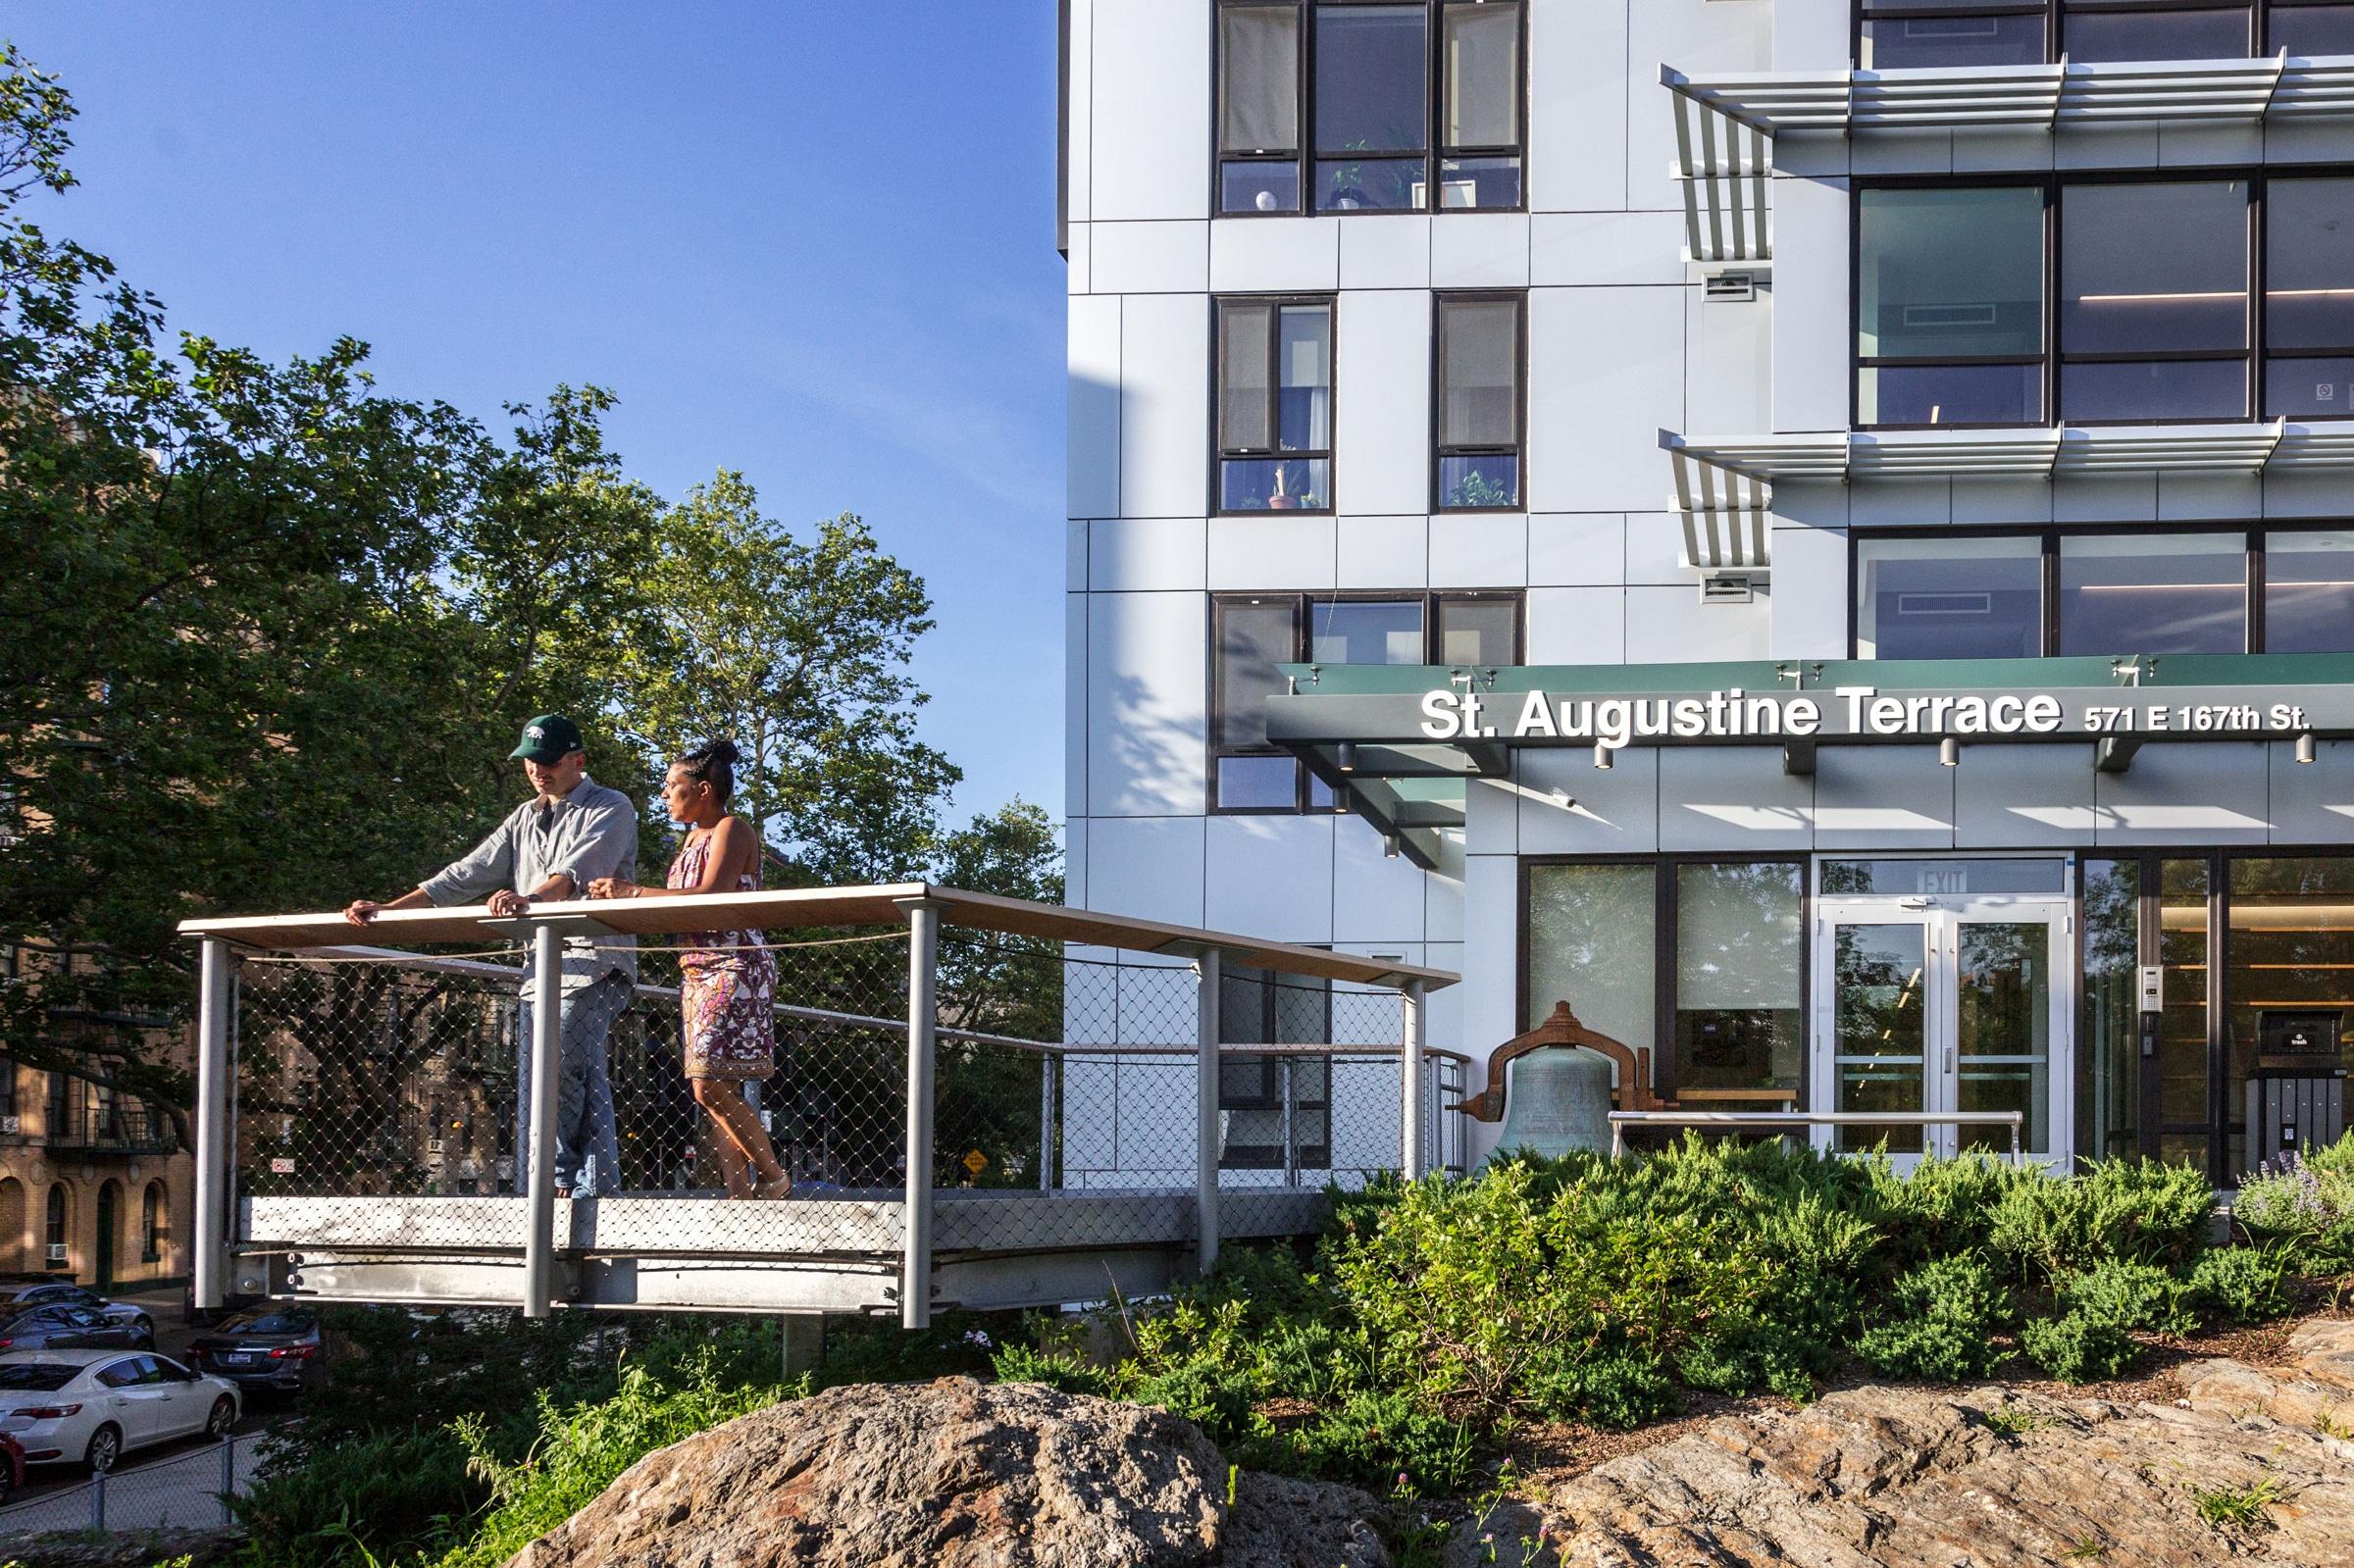 st augustine terrace magnusson architecture gbd magazine